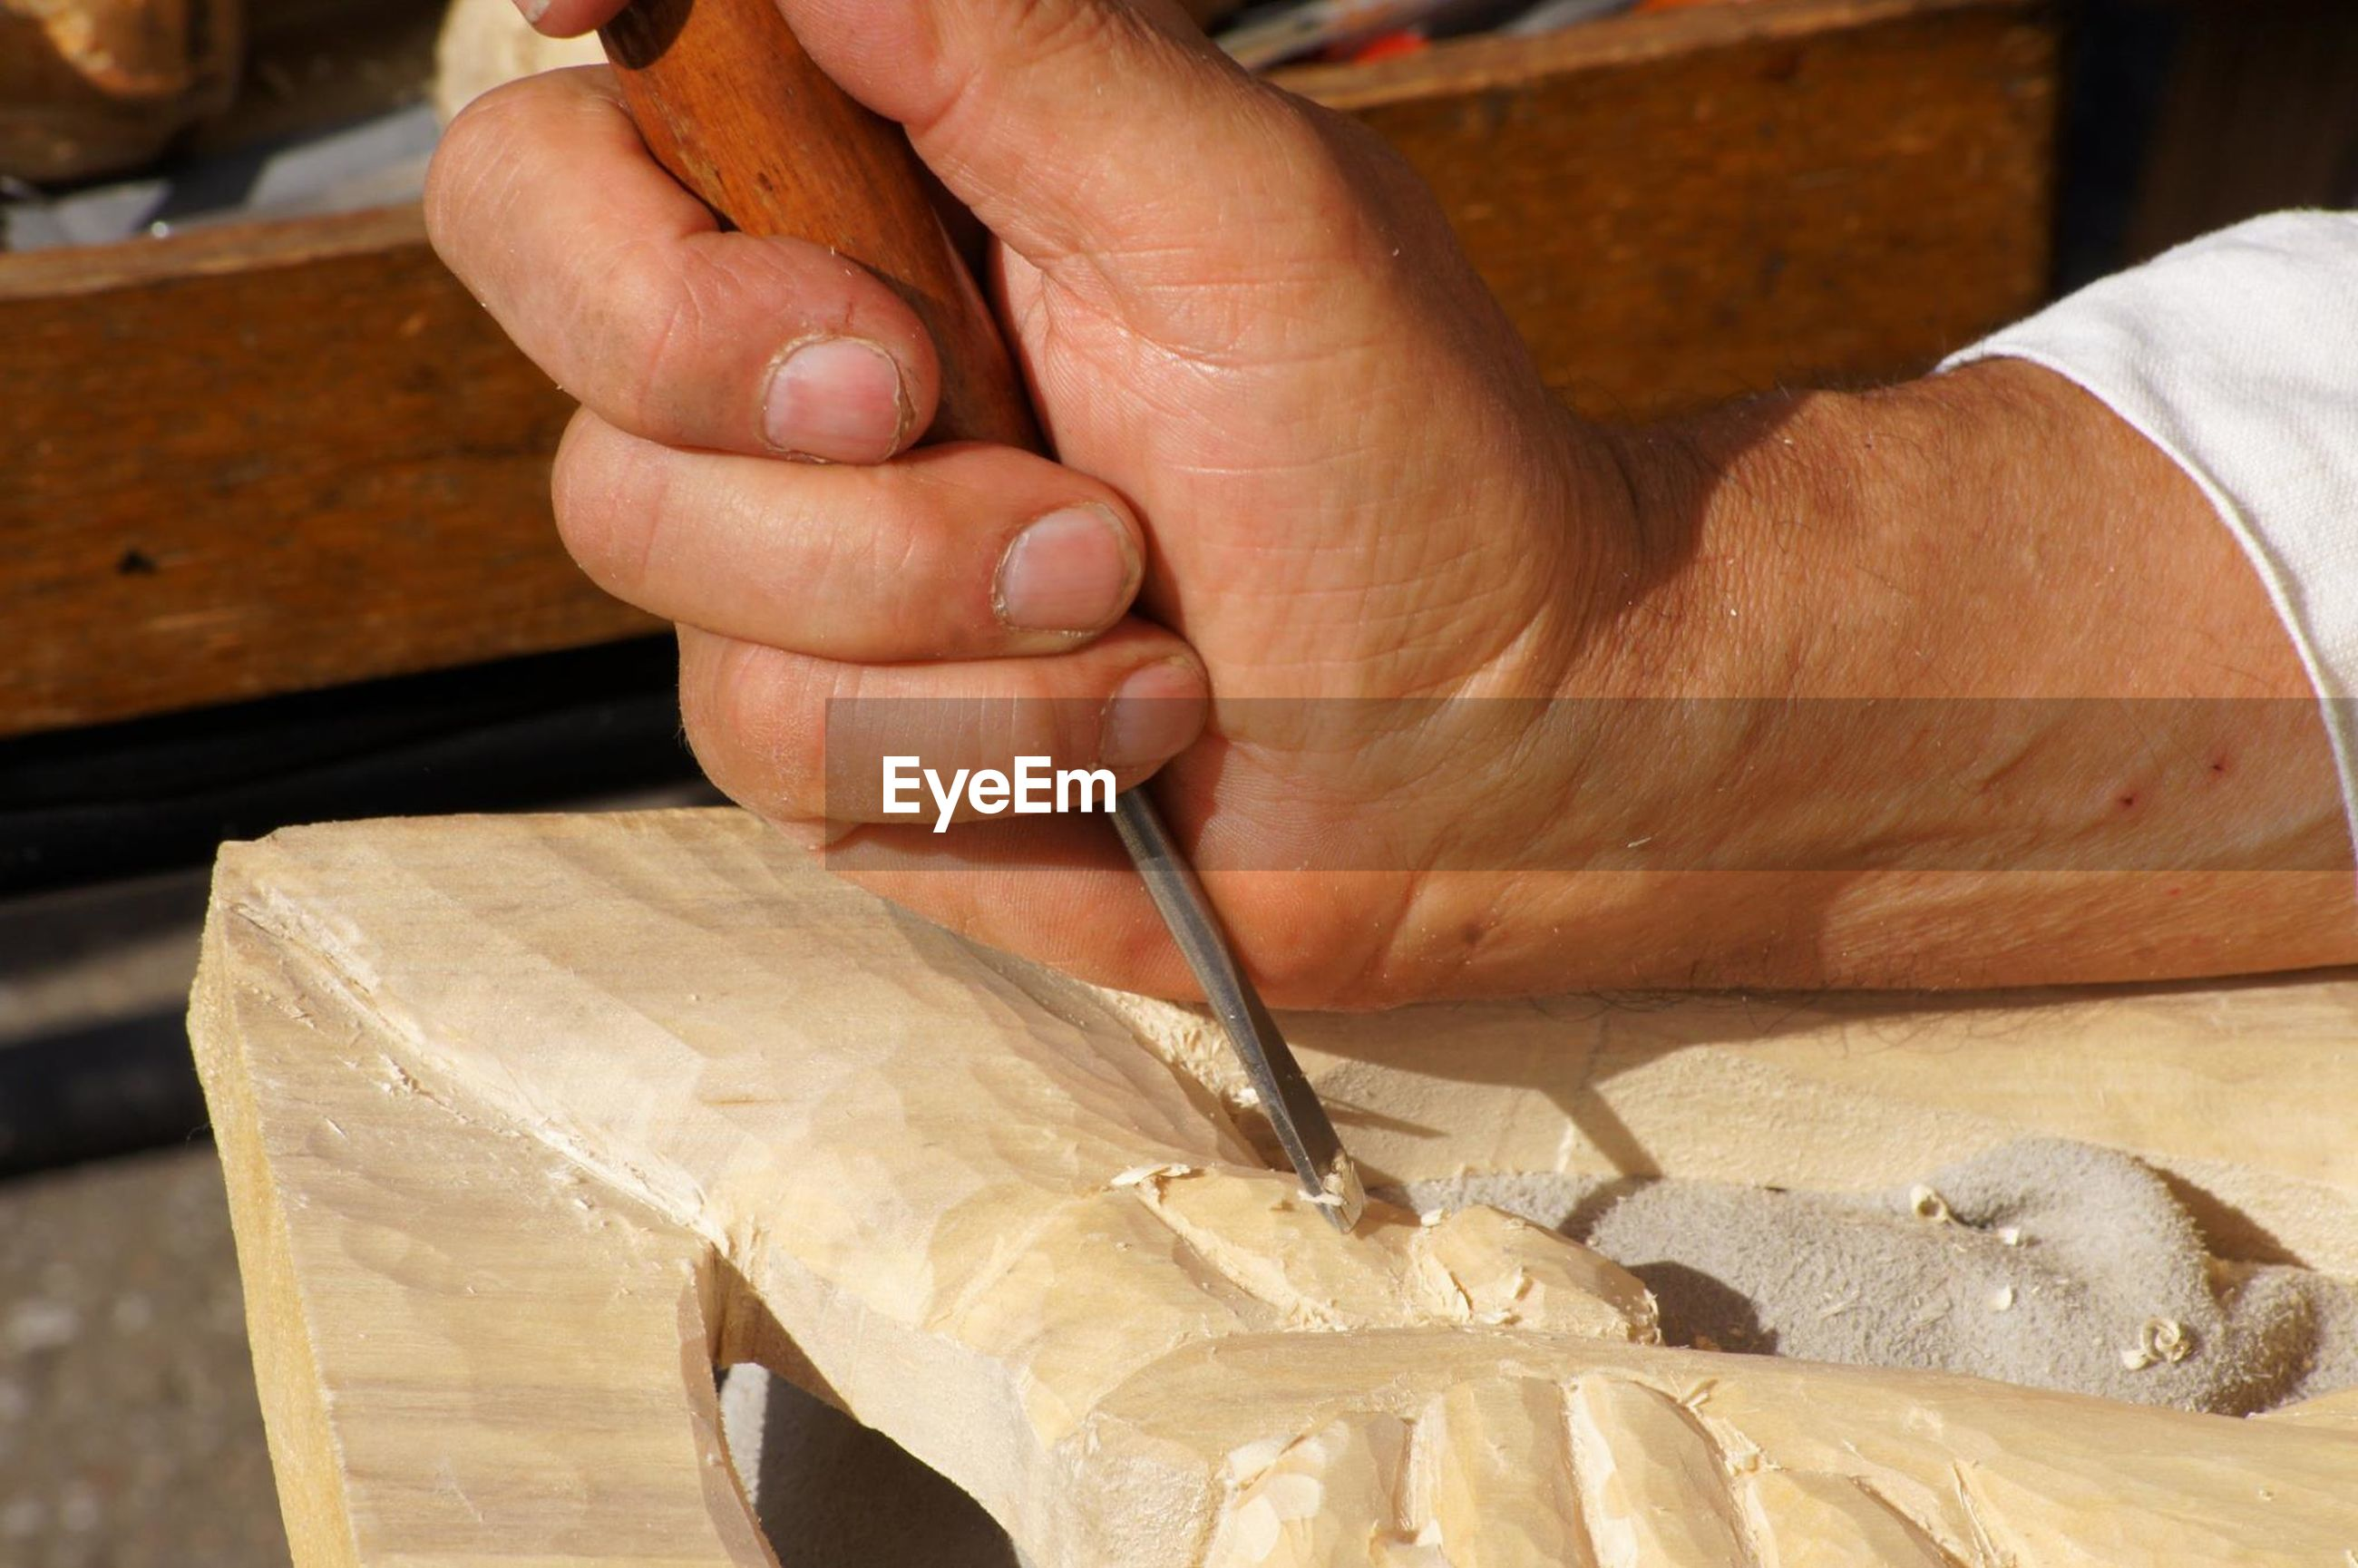 Cropped image of craftsperson carving wood at workshop